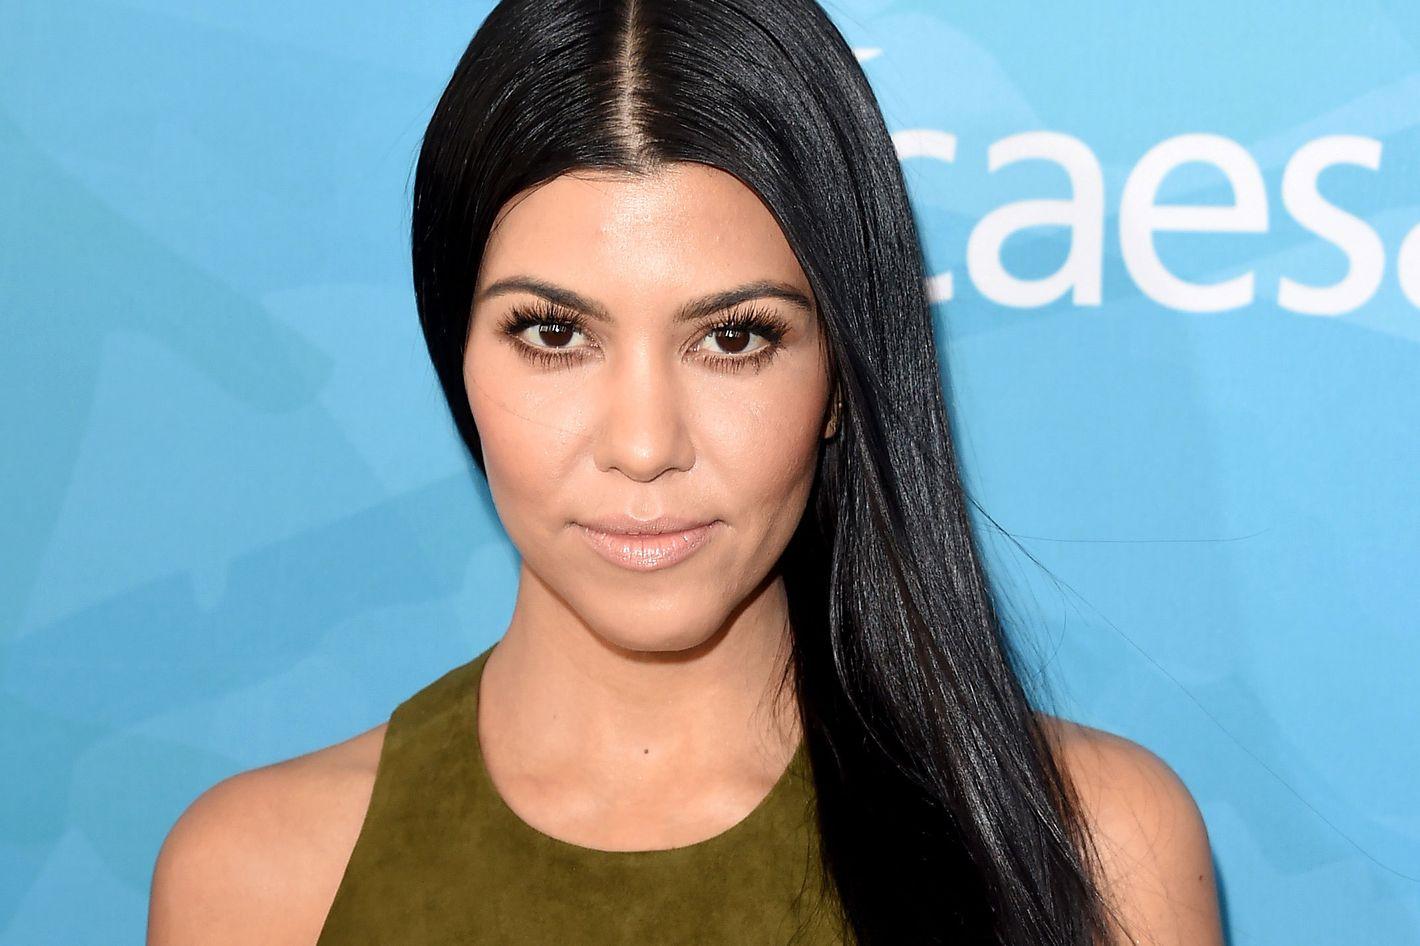 Watch The 9 Ingredients Kourtney Kardashian Puts in Her Go-To DetoxSmoothie video